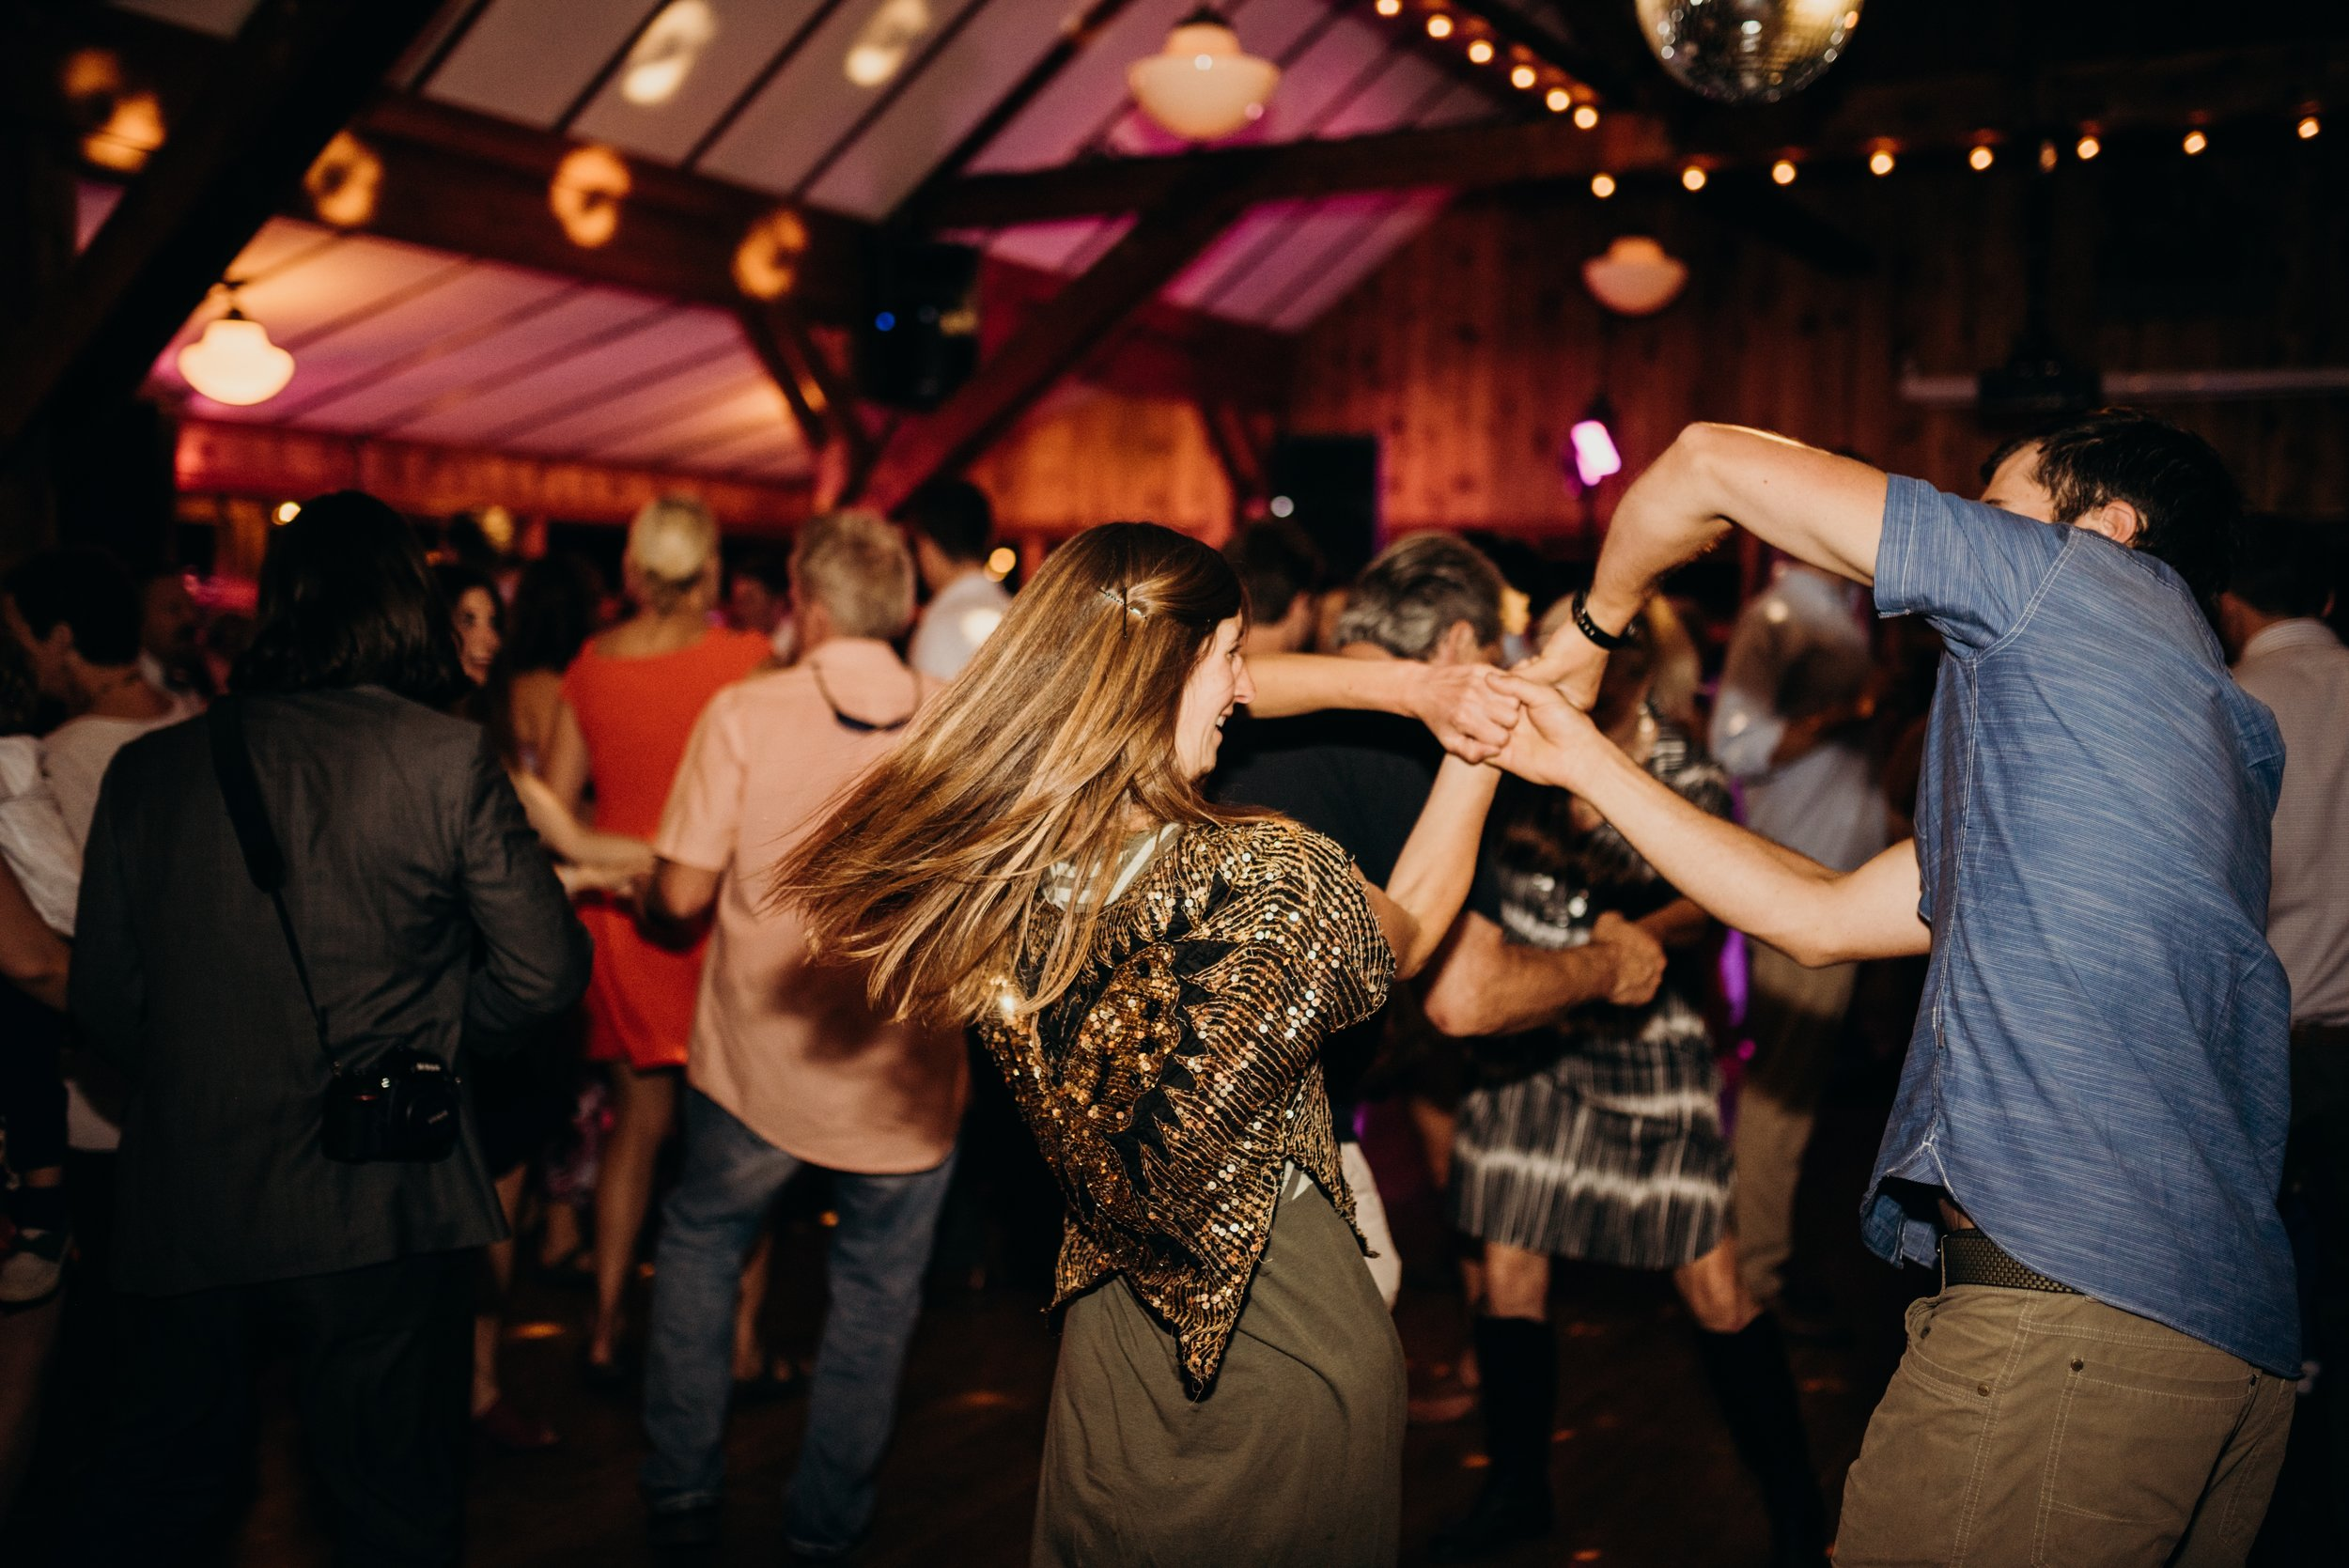 10 Dancing-68.jpeg